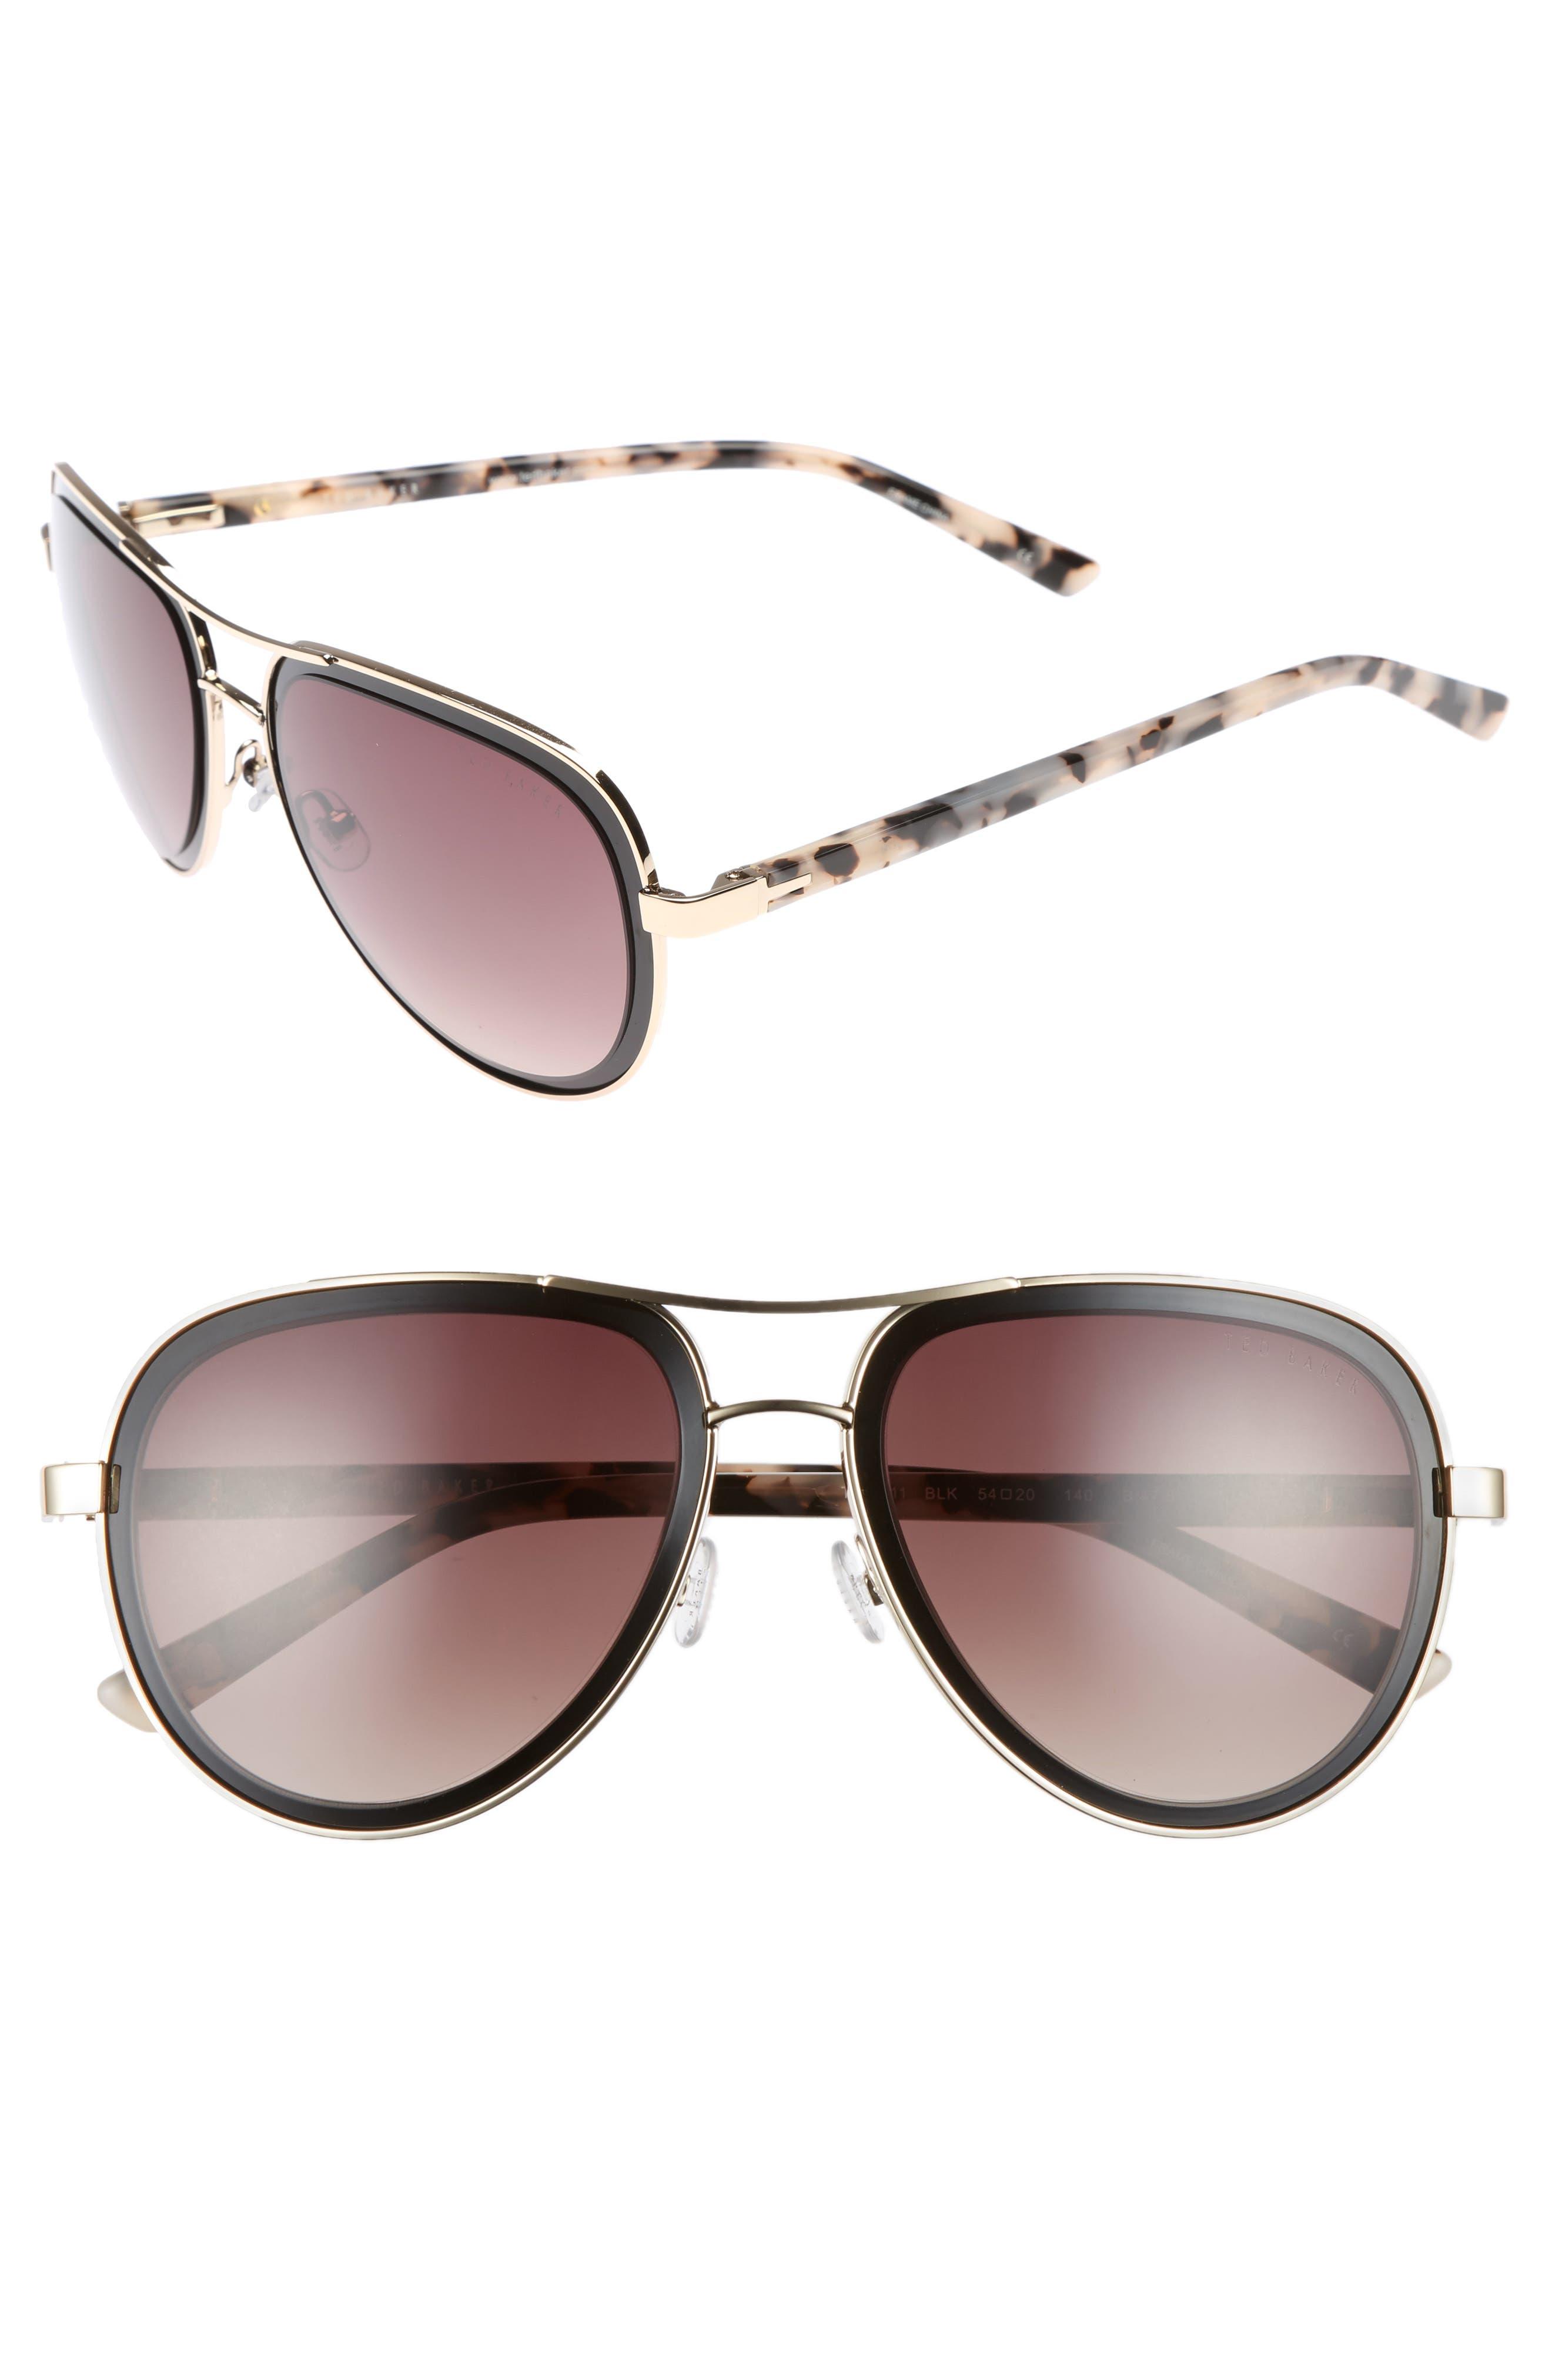 54mm Aviator Sunglasses,                         Main,                         color, Black